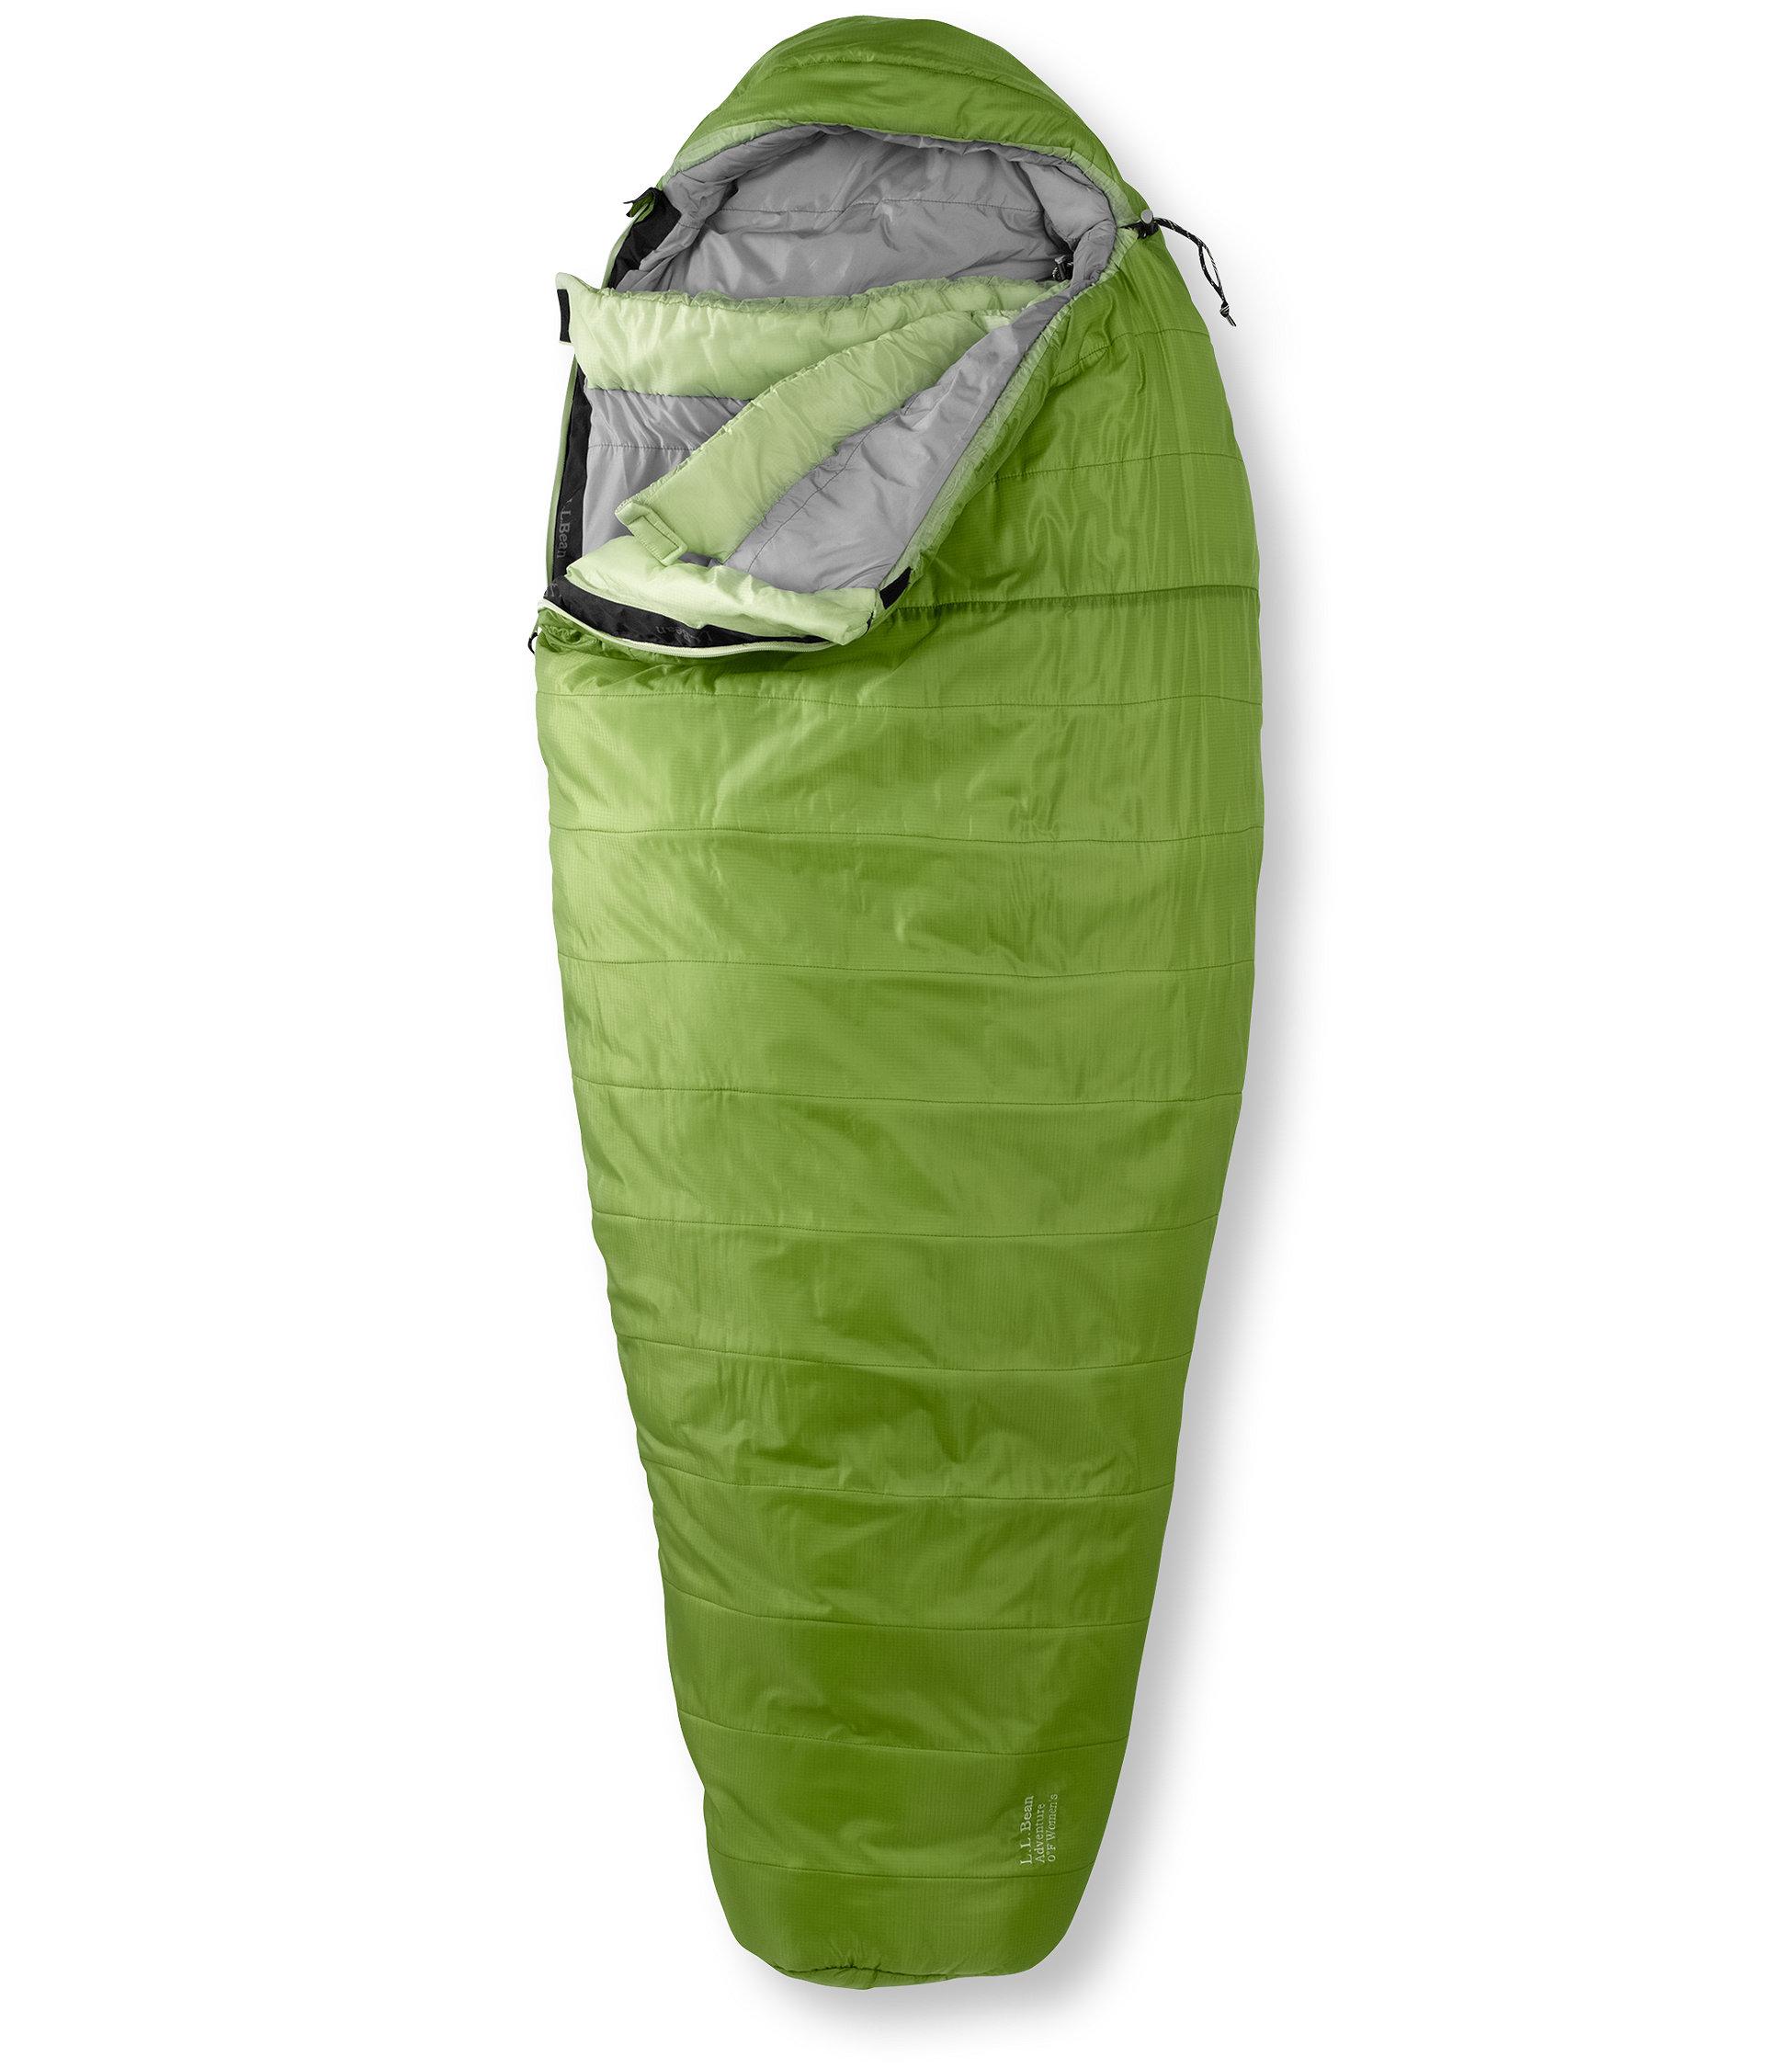 L.L.Bean Adventure Sleeping Bag, Mummy 0